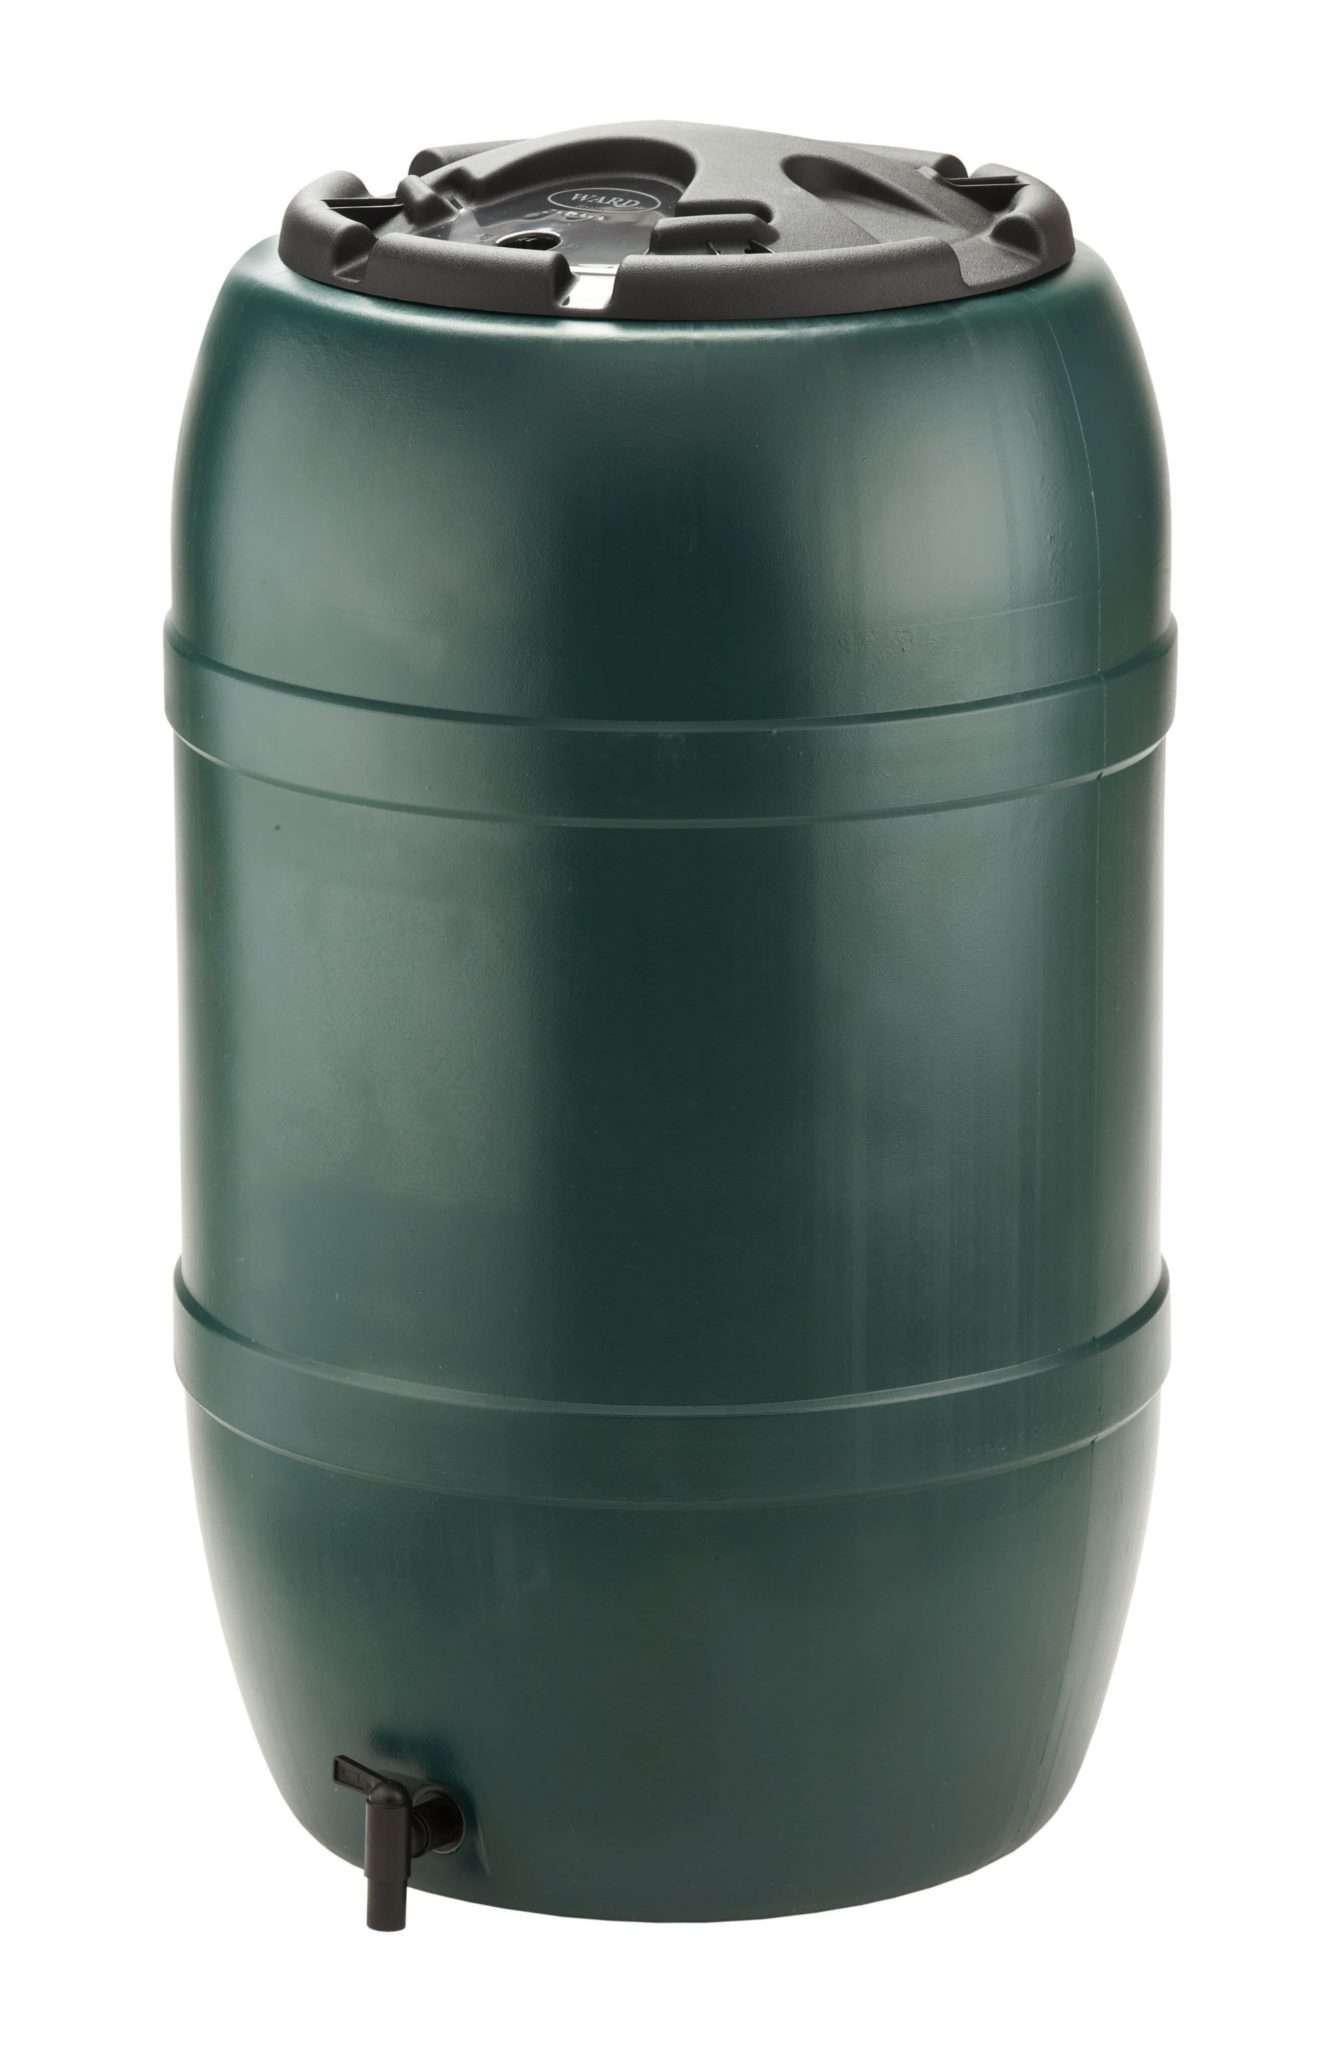 210L Water Butt c/w Lid